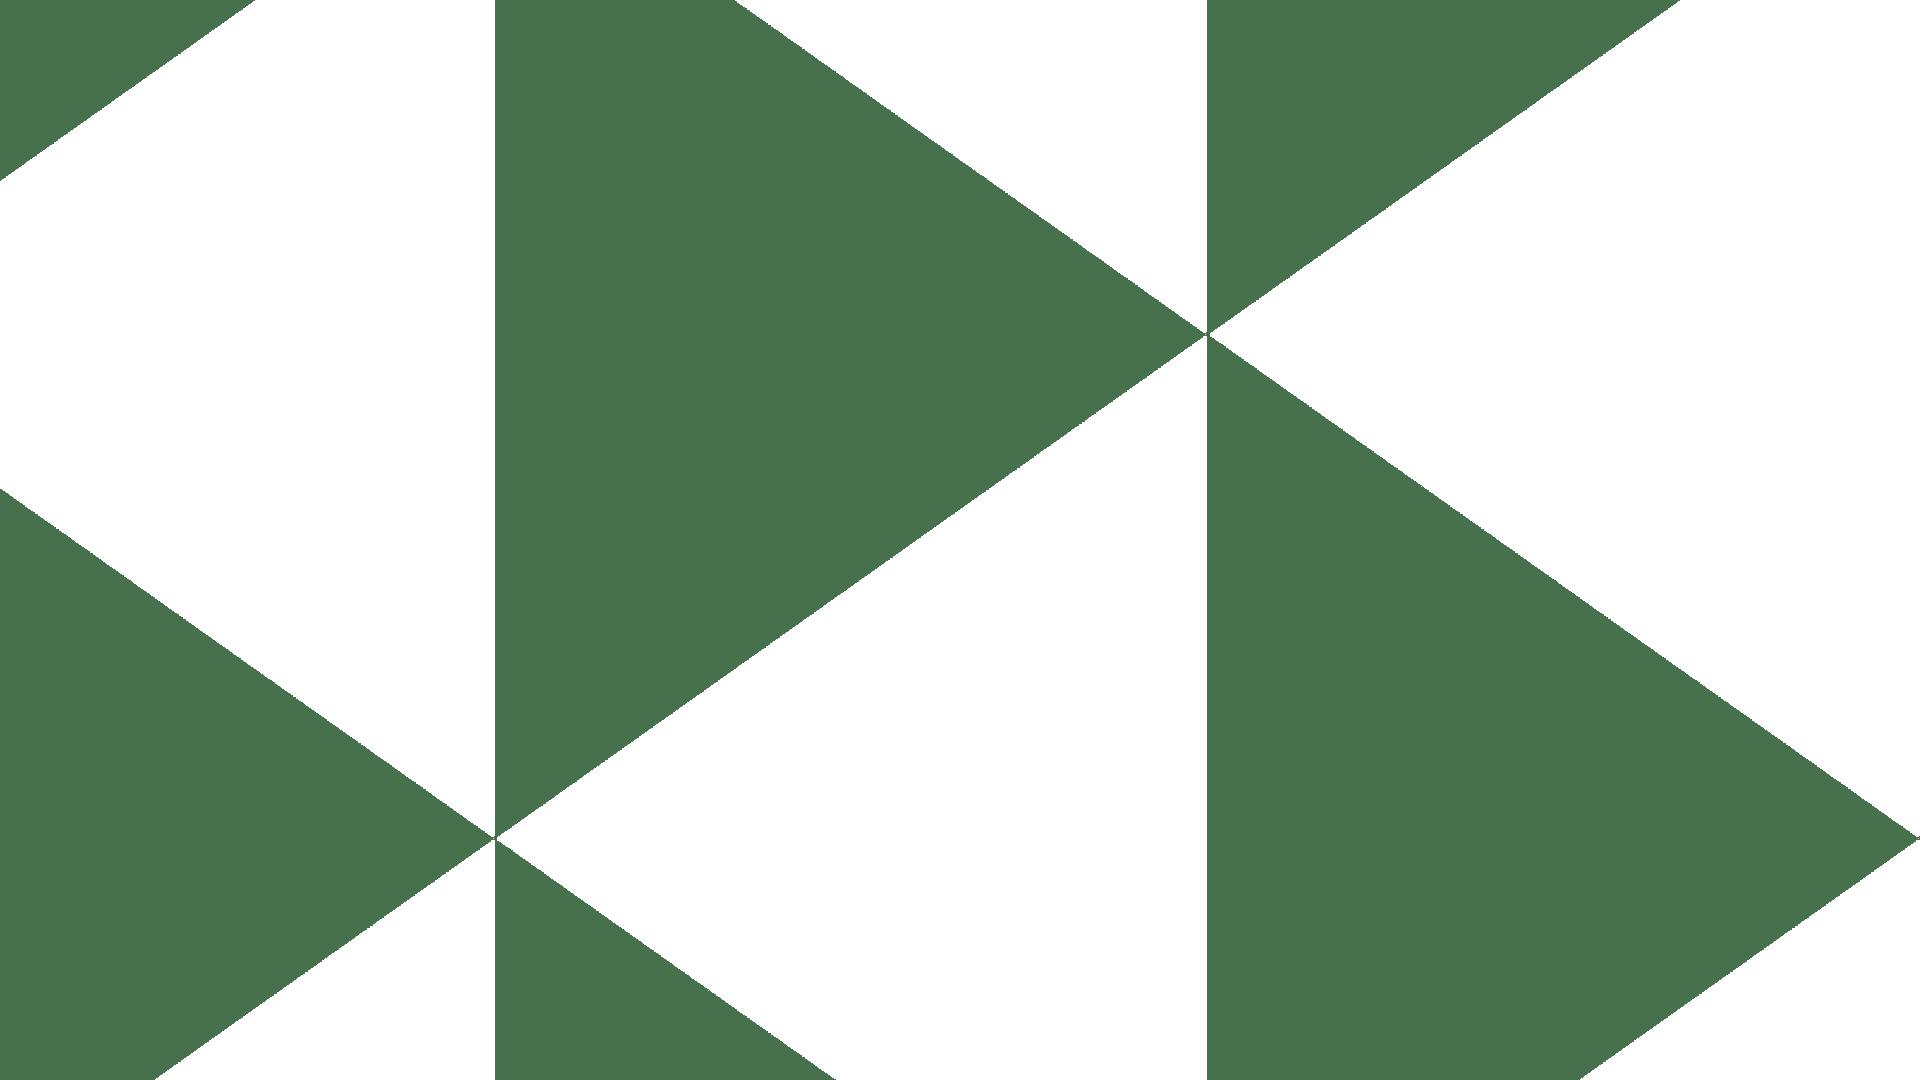 Transparante huisstijl elementen